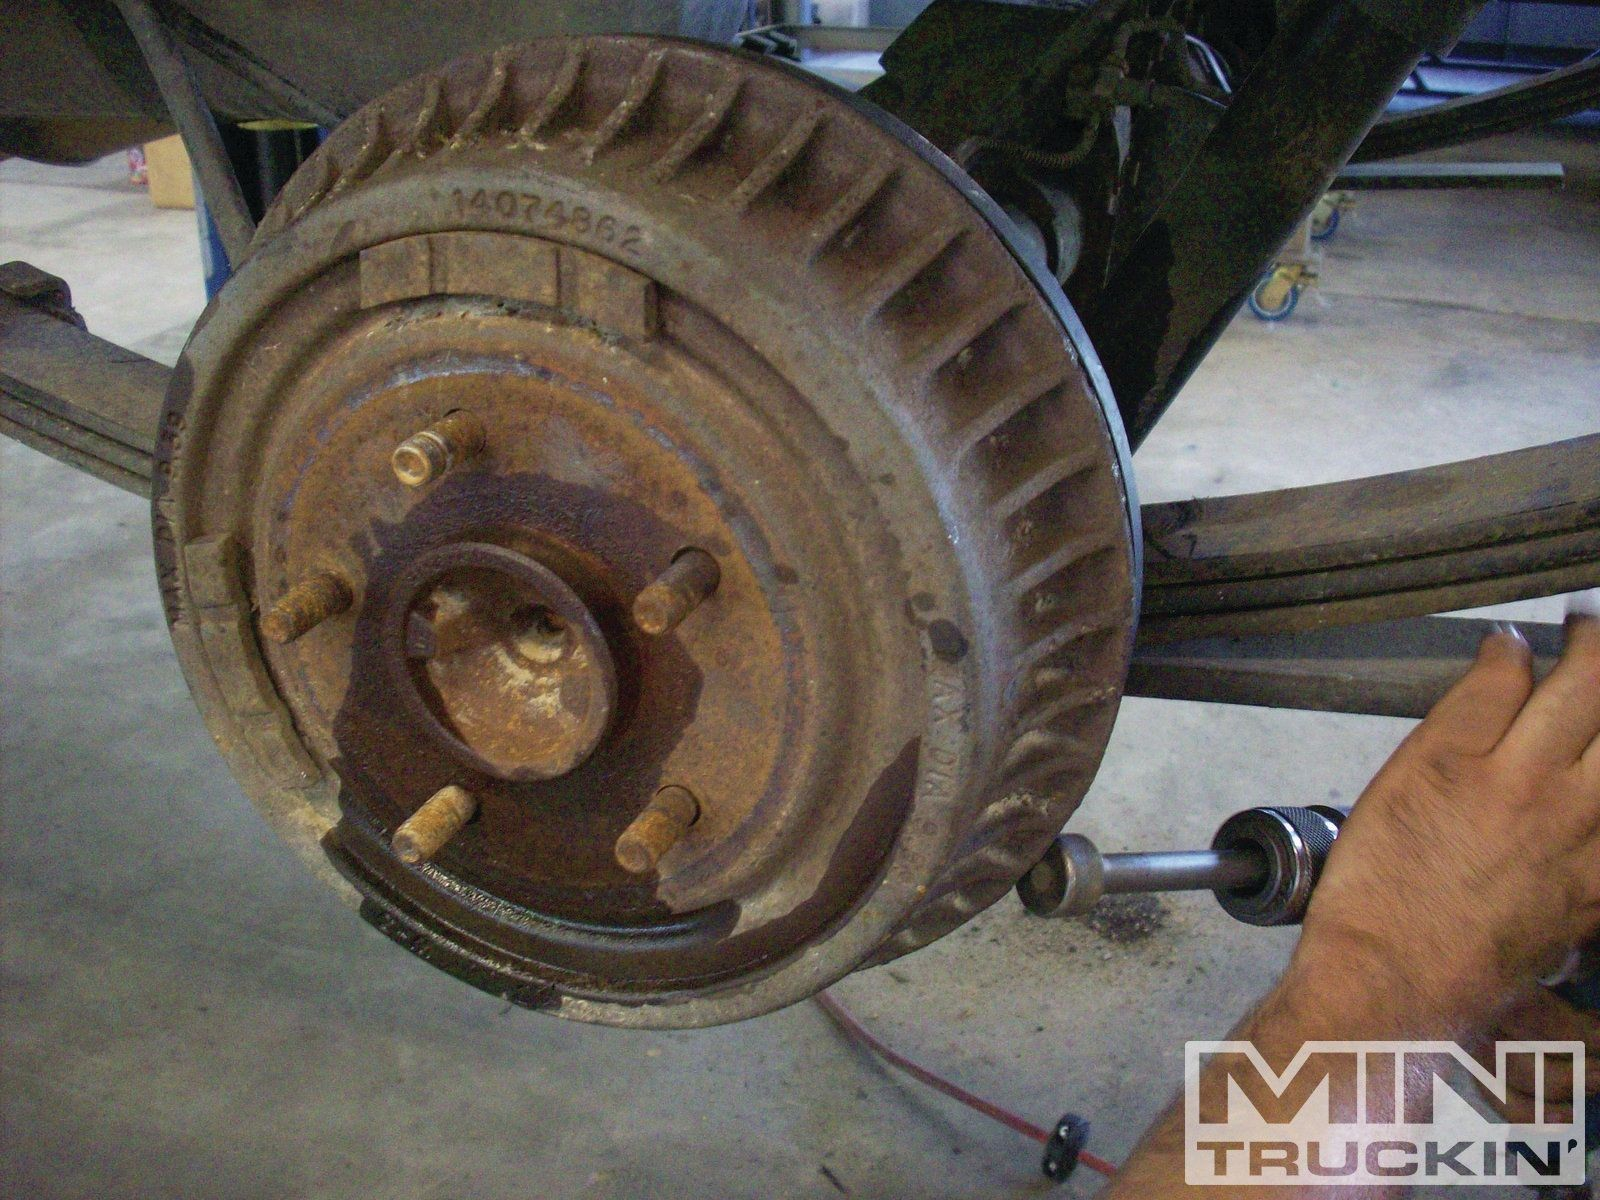 Rear Drum Brake Diagram Chevy S10 Rear Disc Brake Conversion bye bye to Dumb Drums Mini Of Rear Drum Brake Diagram